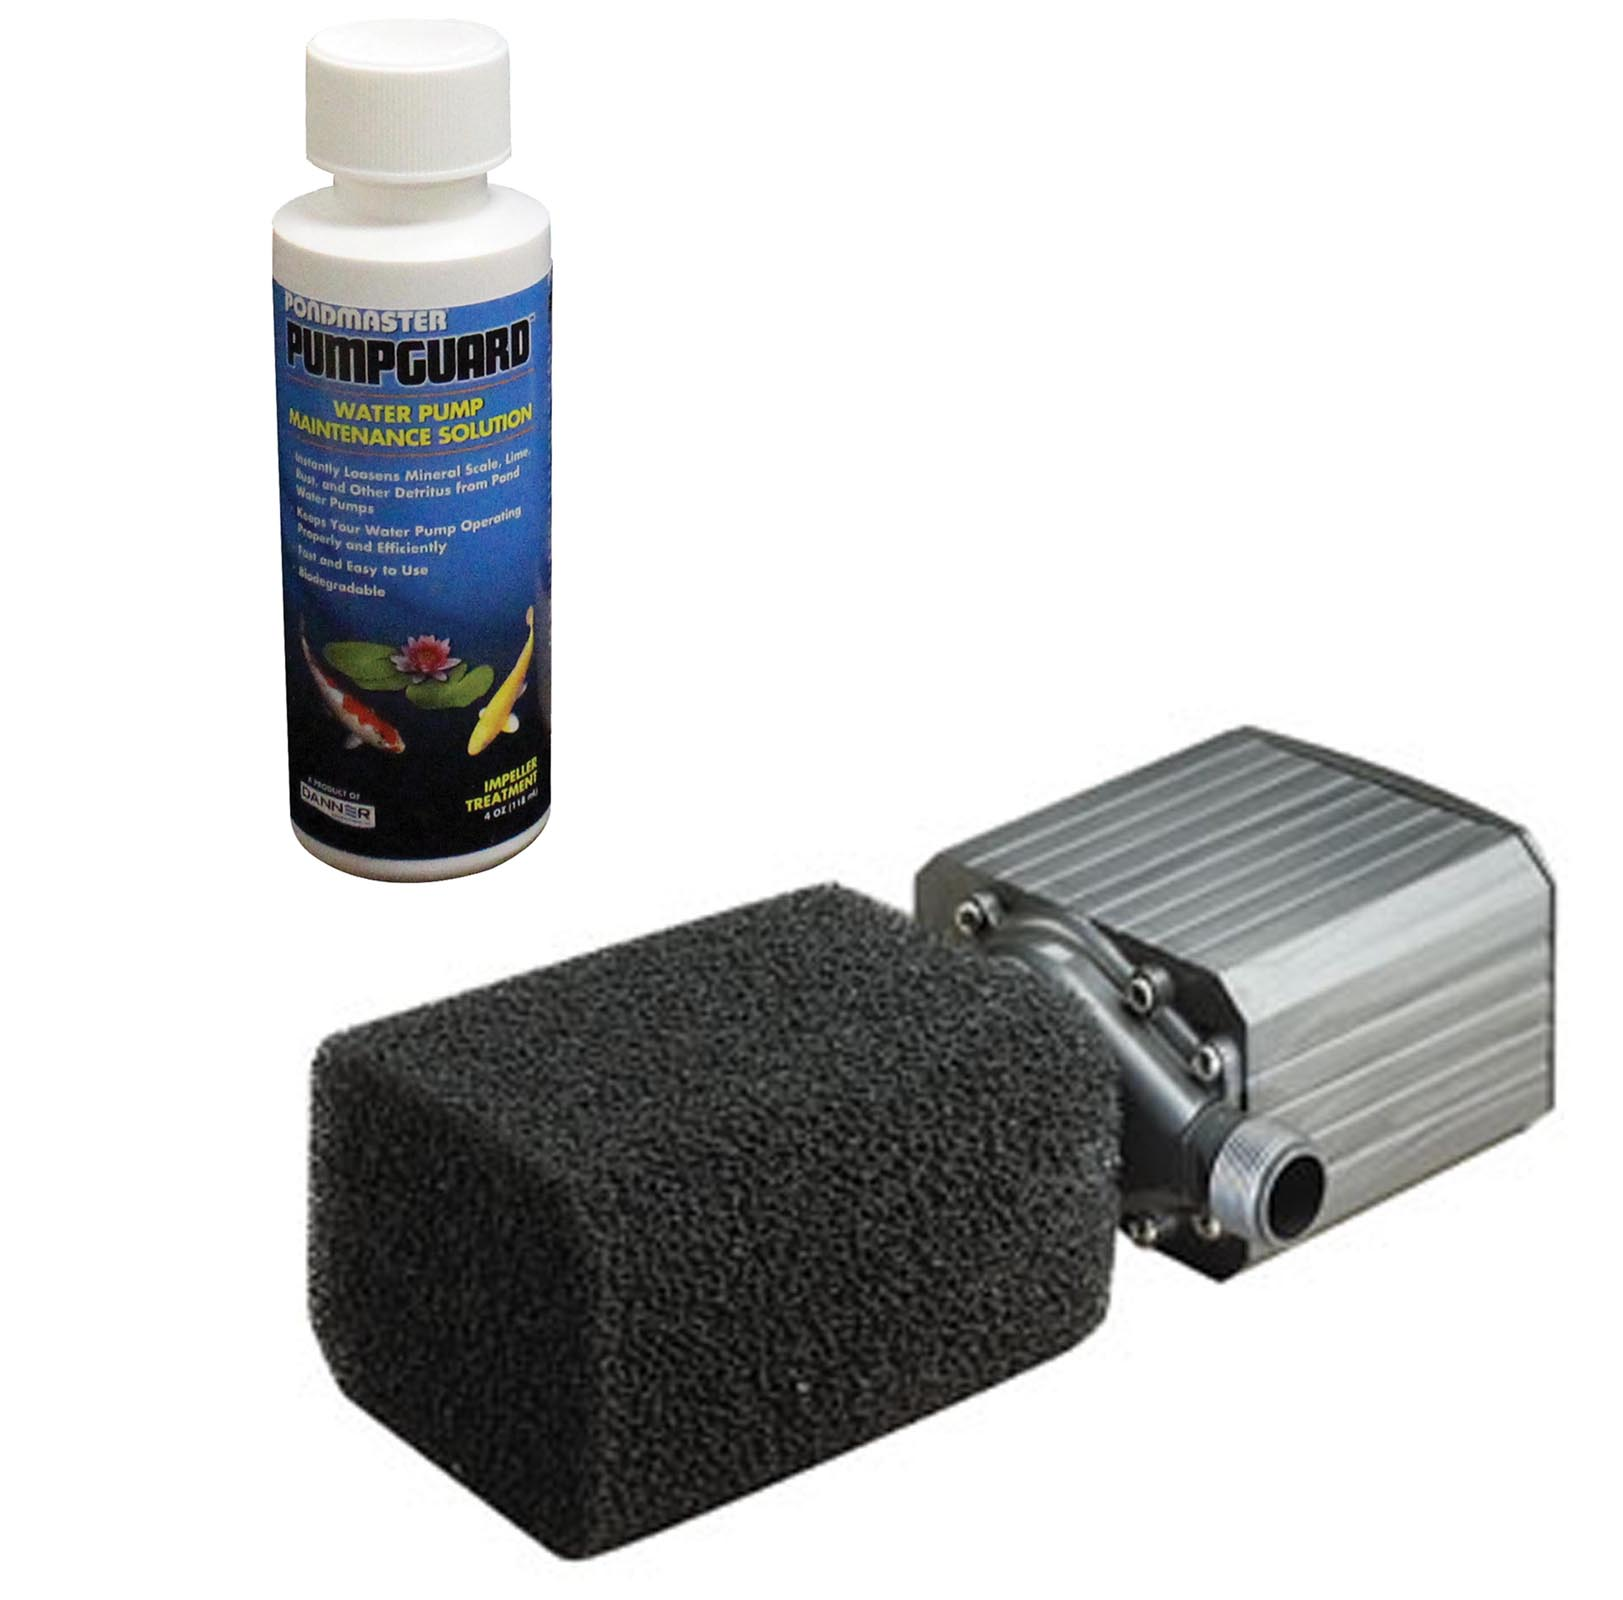 PONDMASTER Model 18 Supreme 1800 GPH Mag Drive Pond Pump w  Solution | 02718 by Danner Manufacturing, Inc.